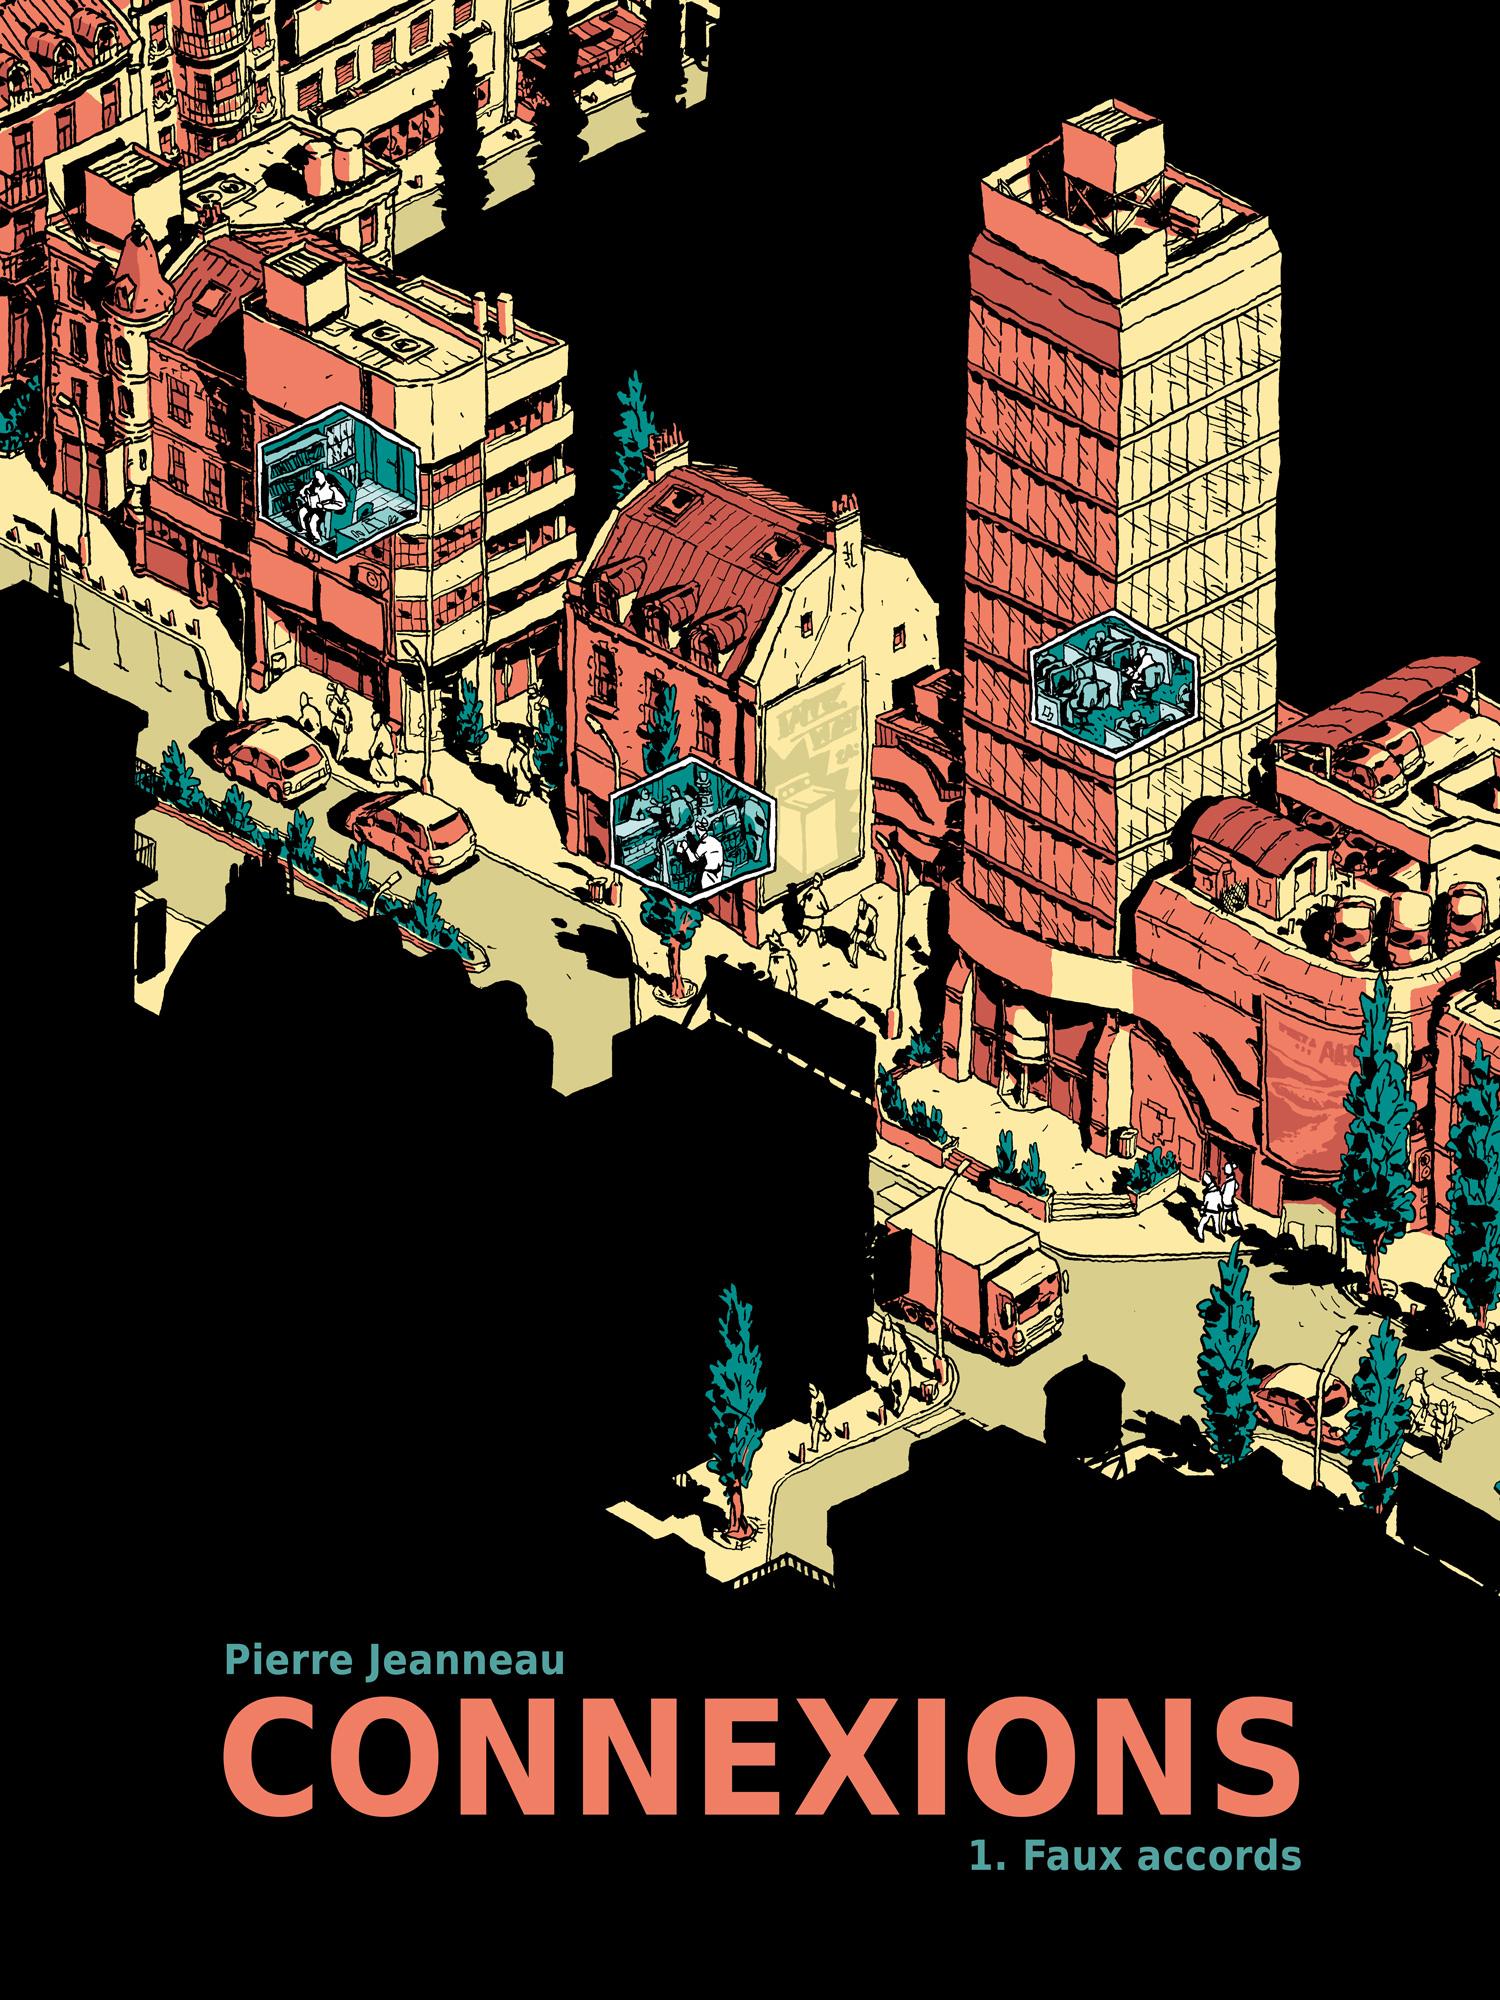 CONNEXIONS - 1. FAUX ACCORDS